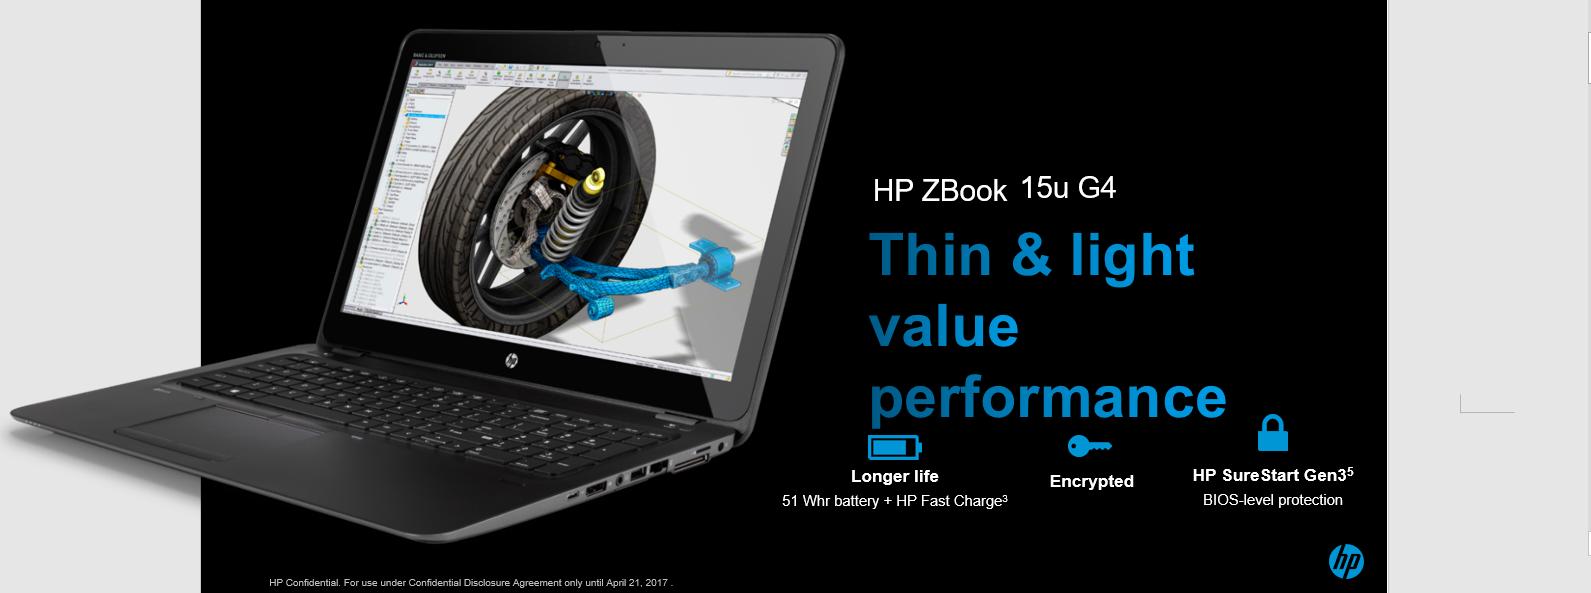 Buy HP ZBook15u G4 Mobile Workstation 2017 15 6-inch Laptop (7th Gen